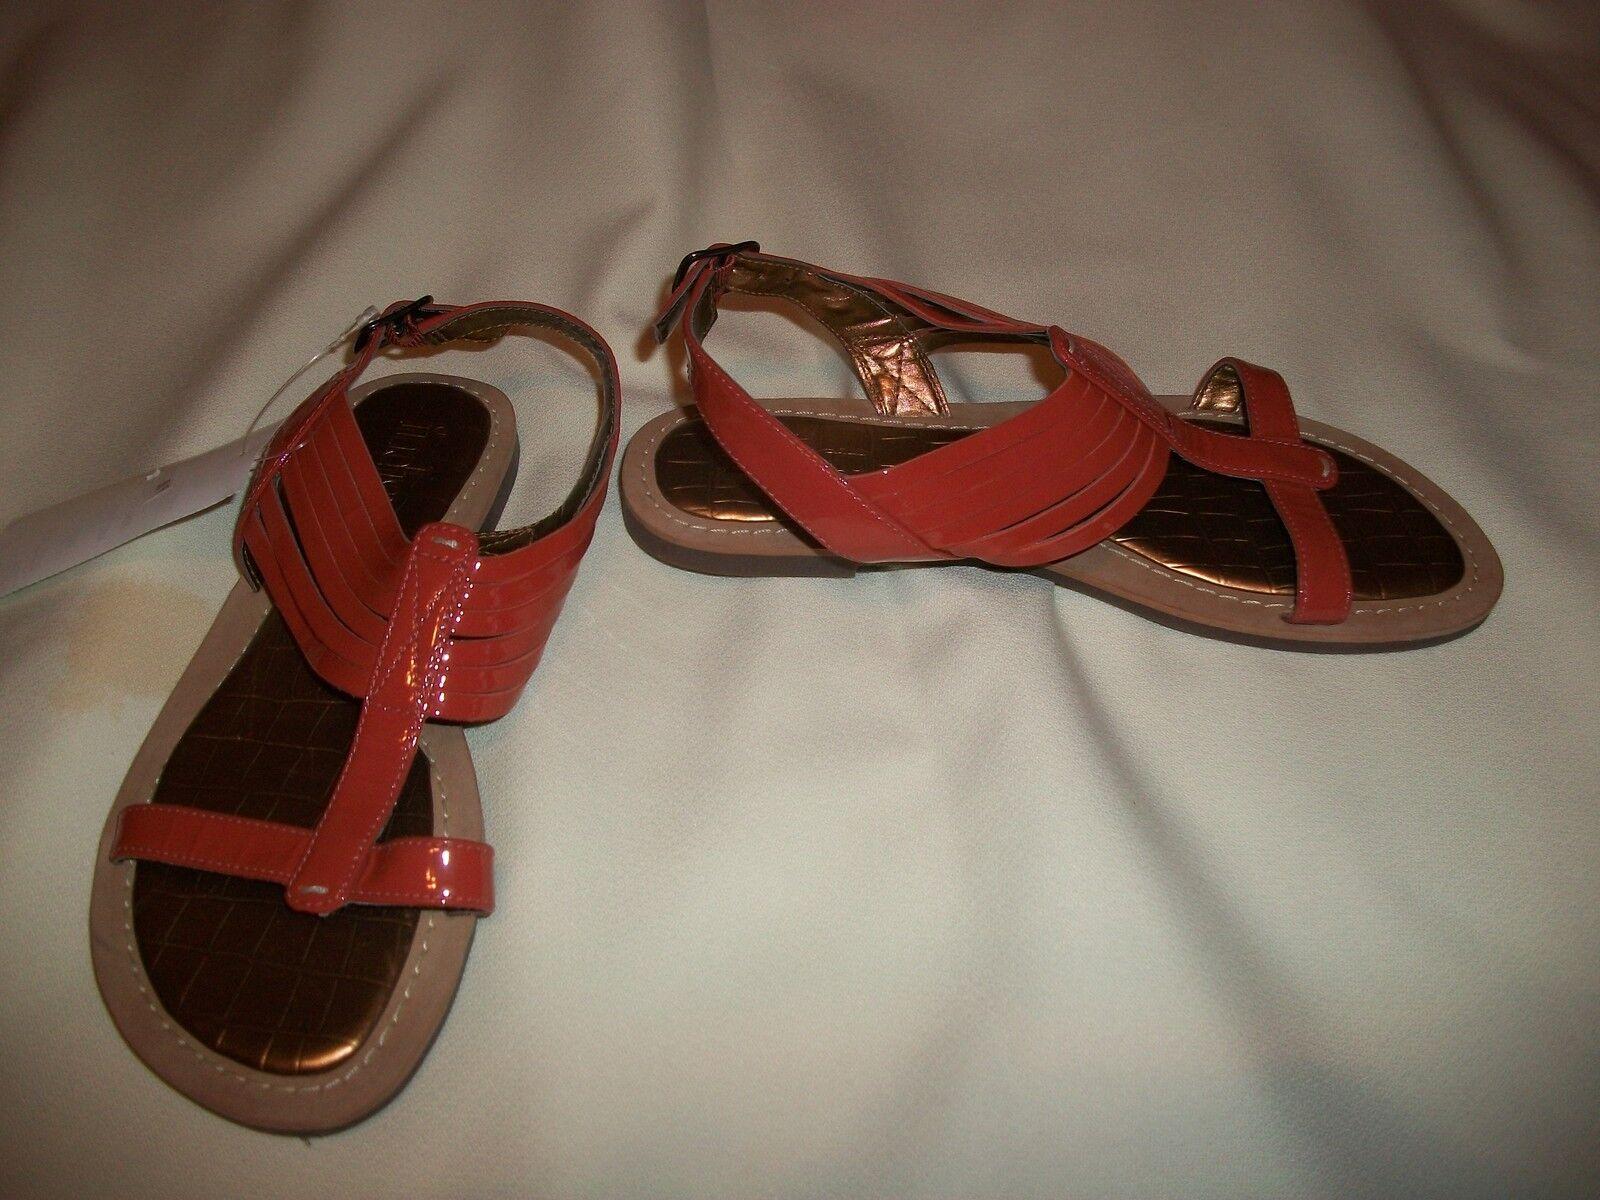 Skechers Cali Women's Rumblers-Hope Float Wedge Sandal SZ 10 Memory Foam White